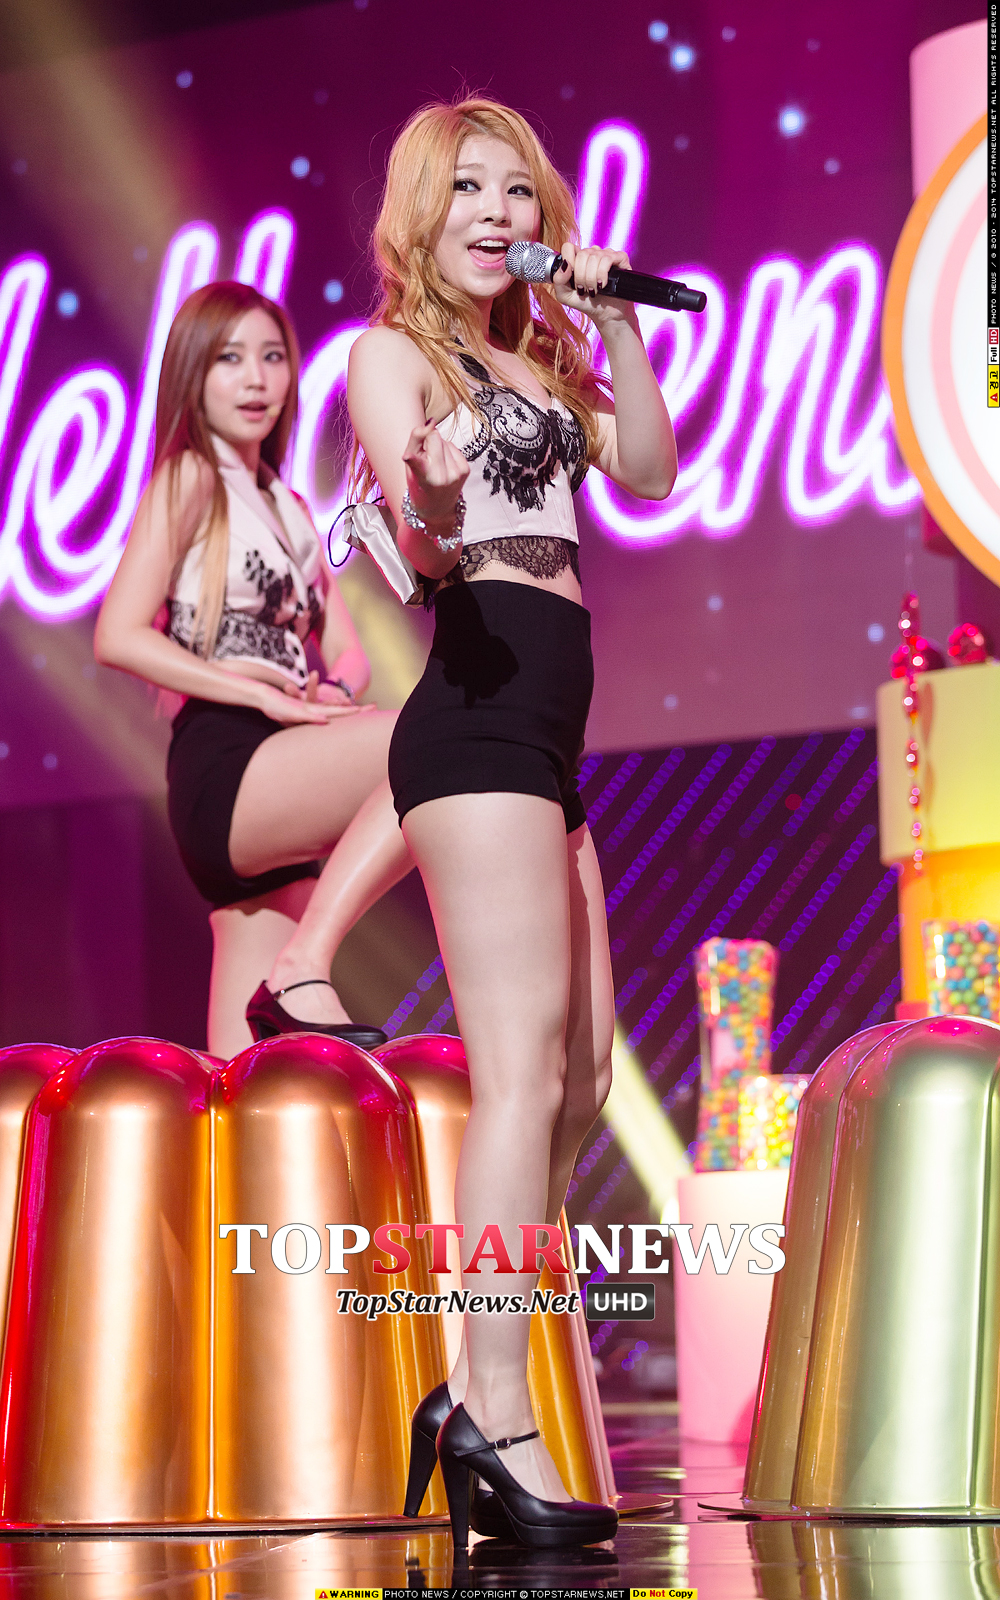 6.Hello Venus序英 小編開始有點懷疑選出這名單的韓國媒體之中有人是她們粉絲XD